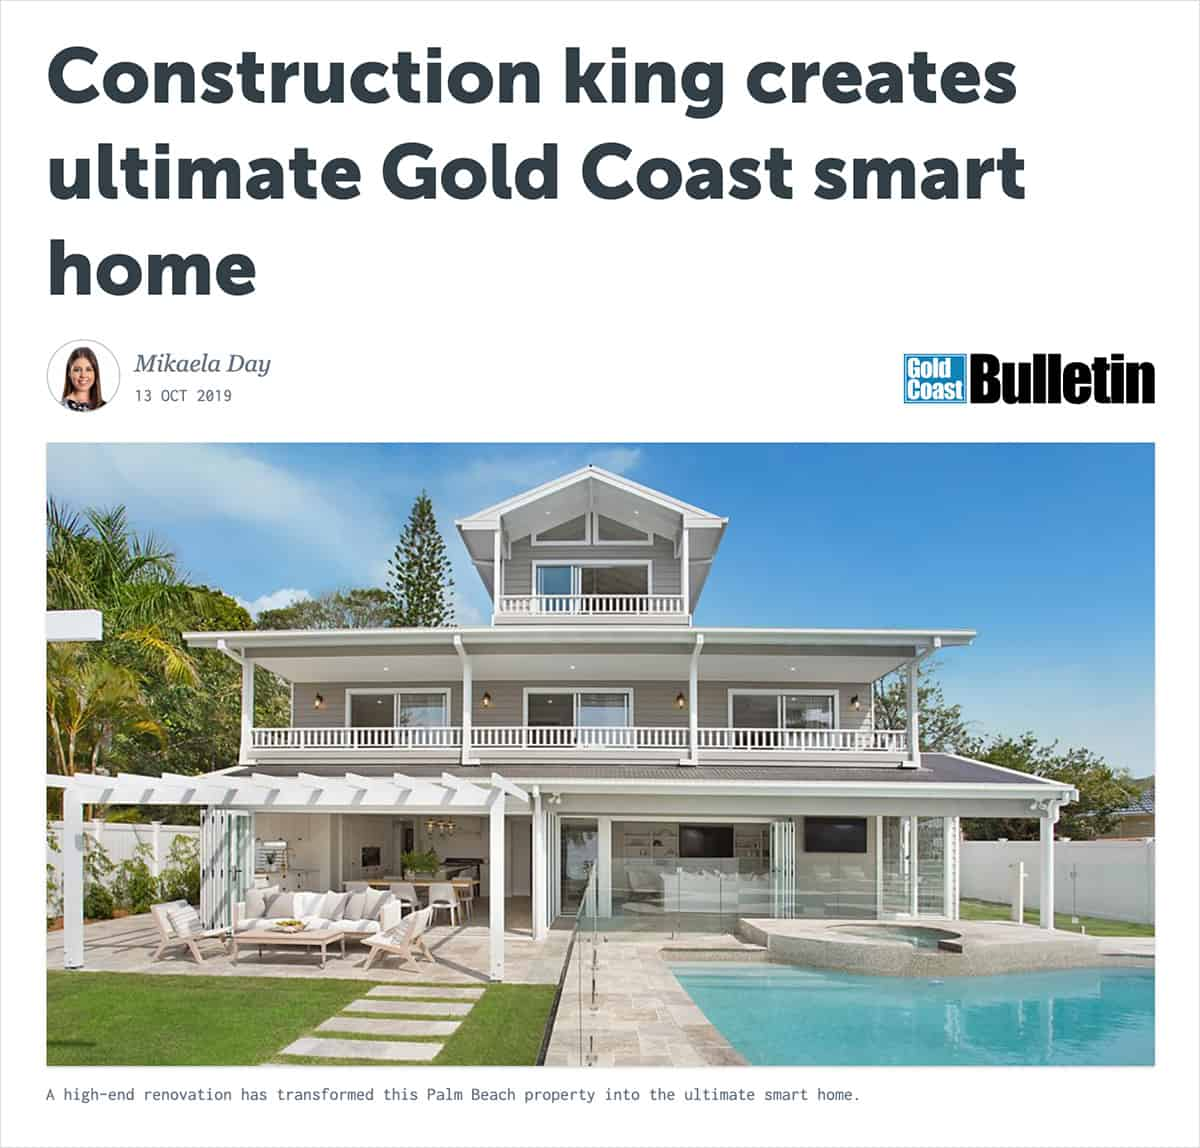 Real Estate.com.au Calls 144 as the 'Ultimate Gold Coast Smart Home'.